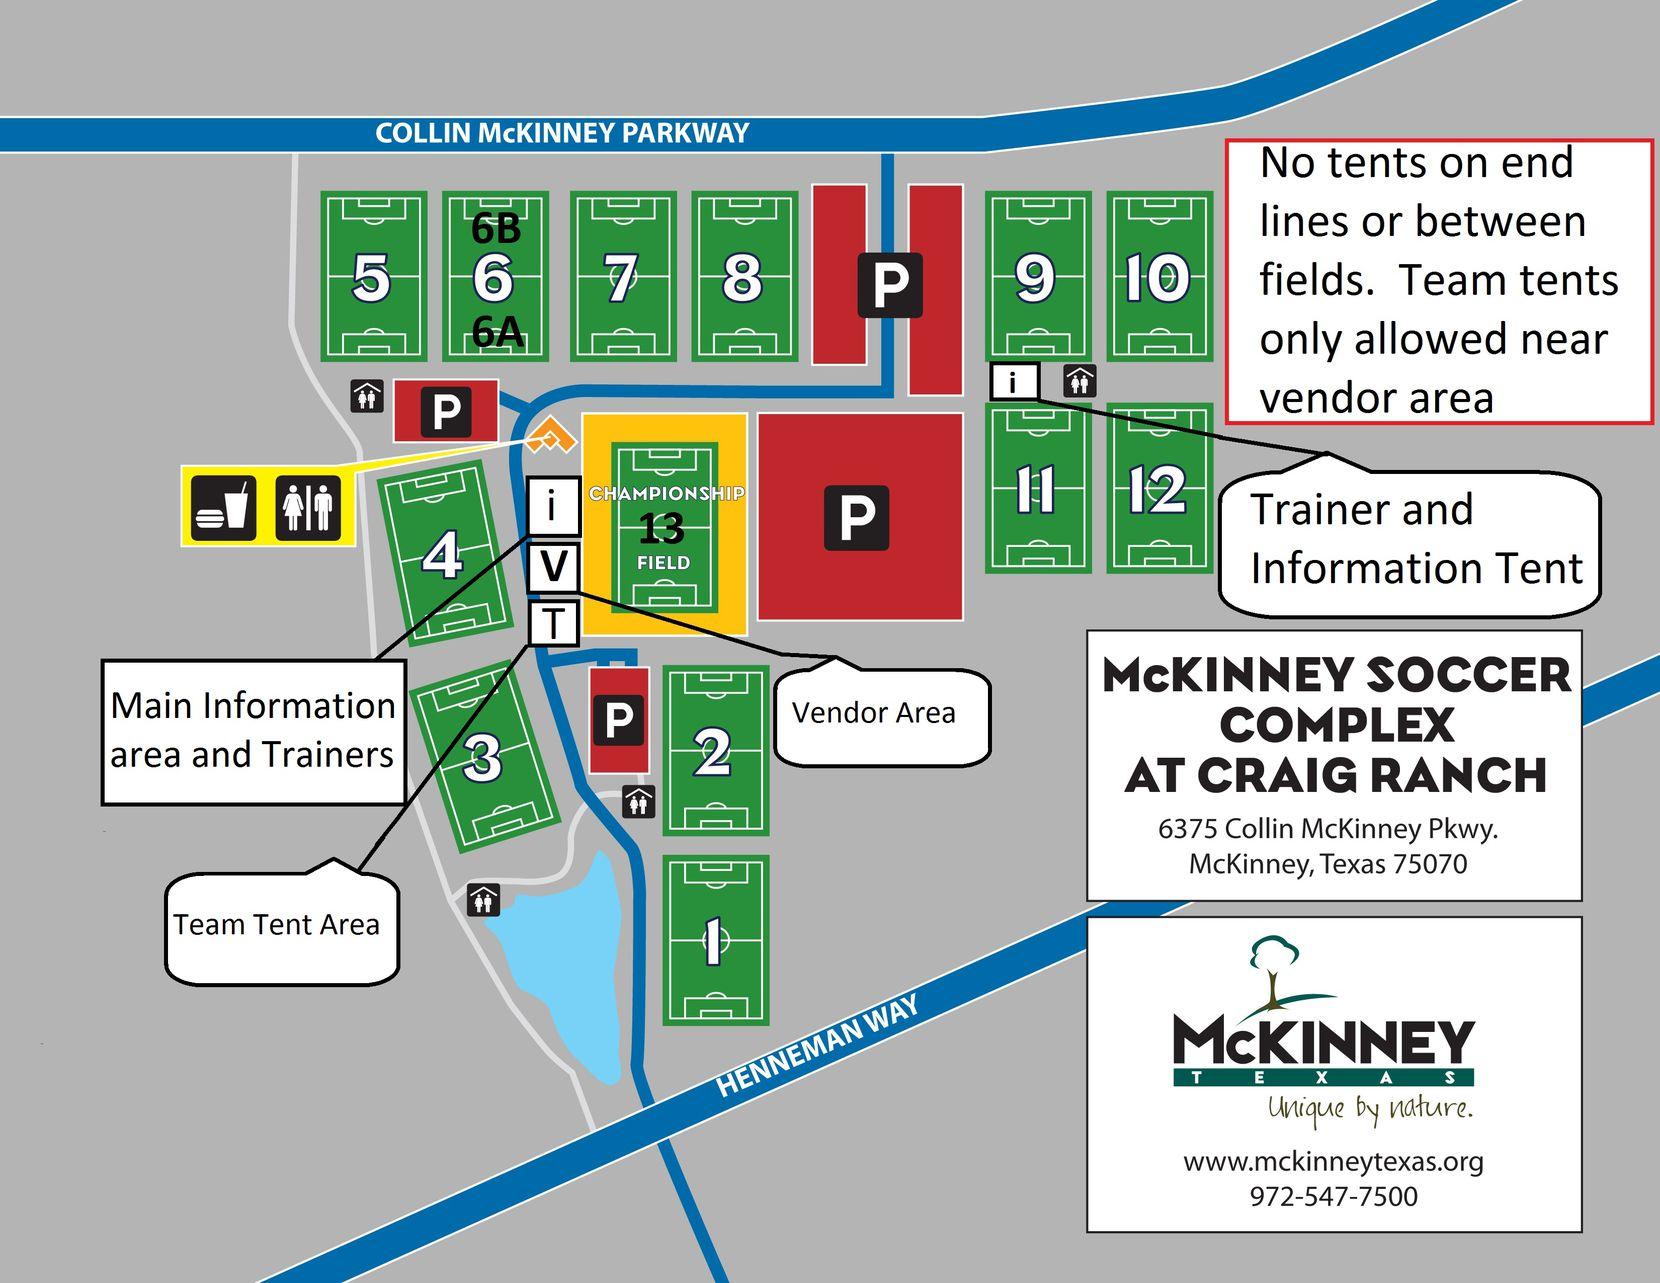 McKinney Soccer Complex at Craig Ranch